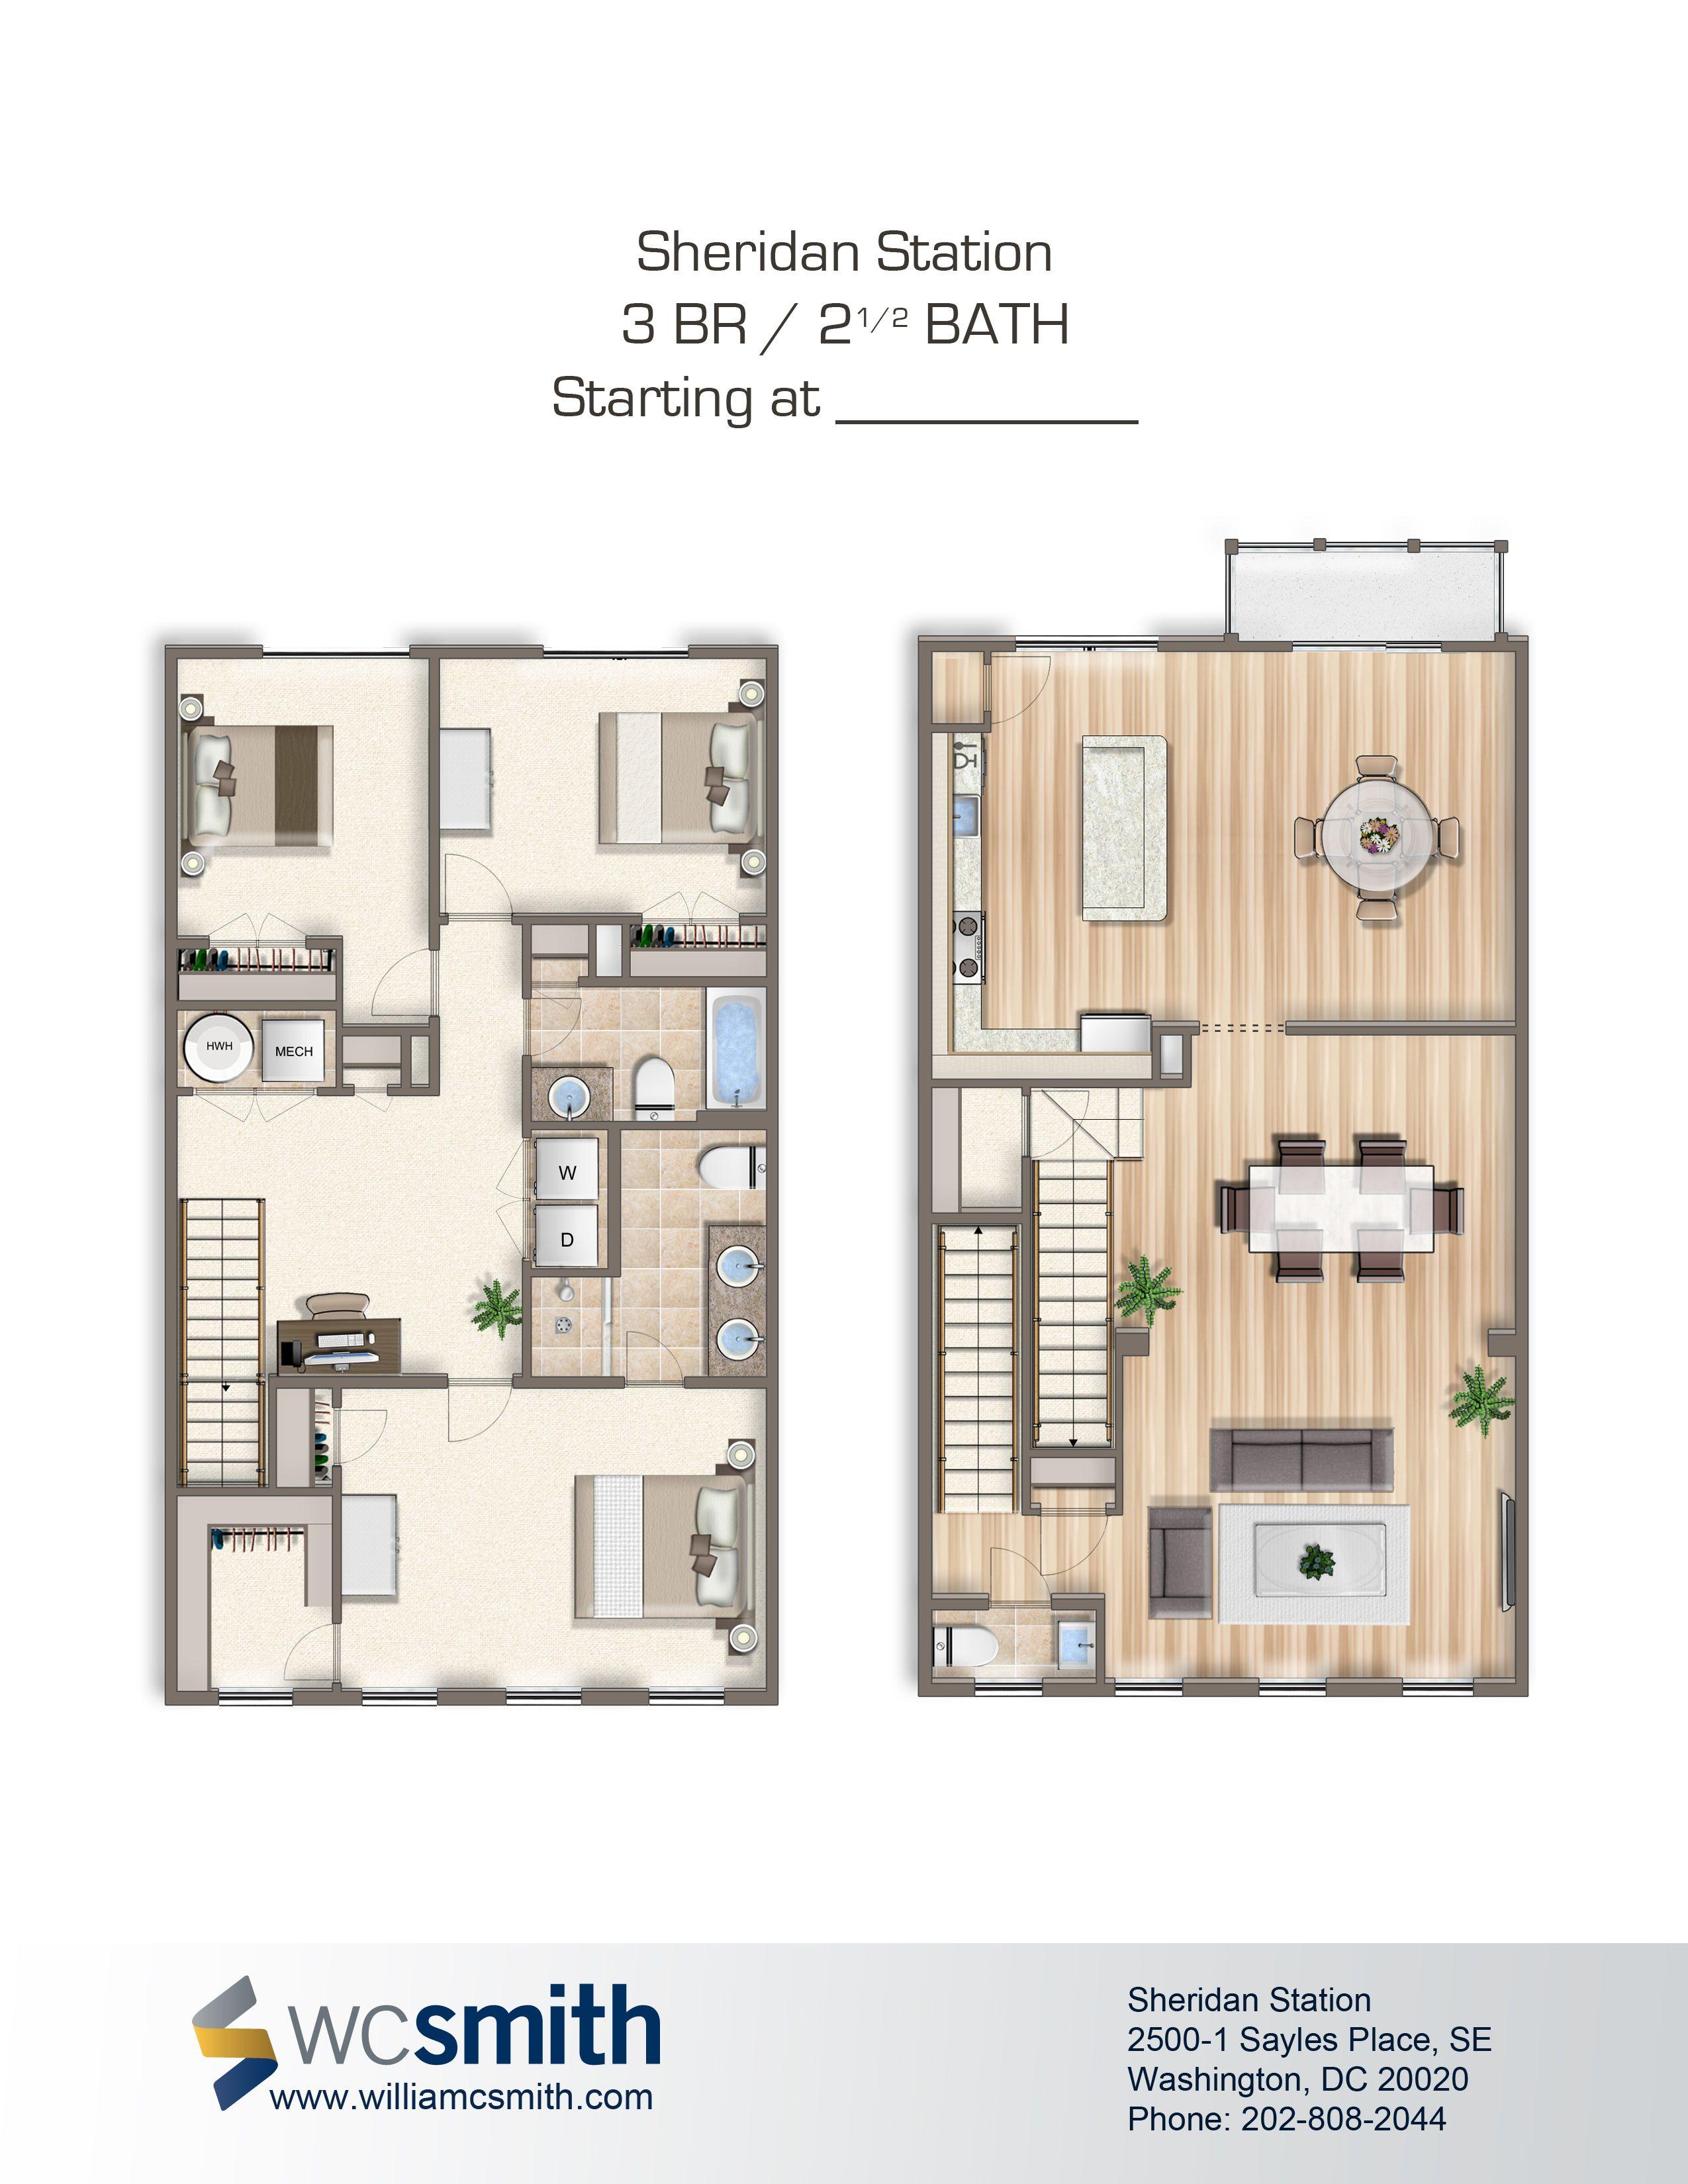 3 Bedroom 2 Bathroom Floor Plan | Sheridan Station In Southeast Washington  DC | WC Smith